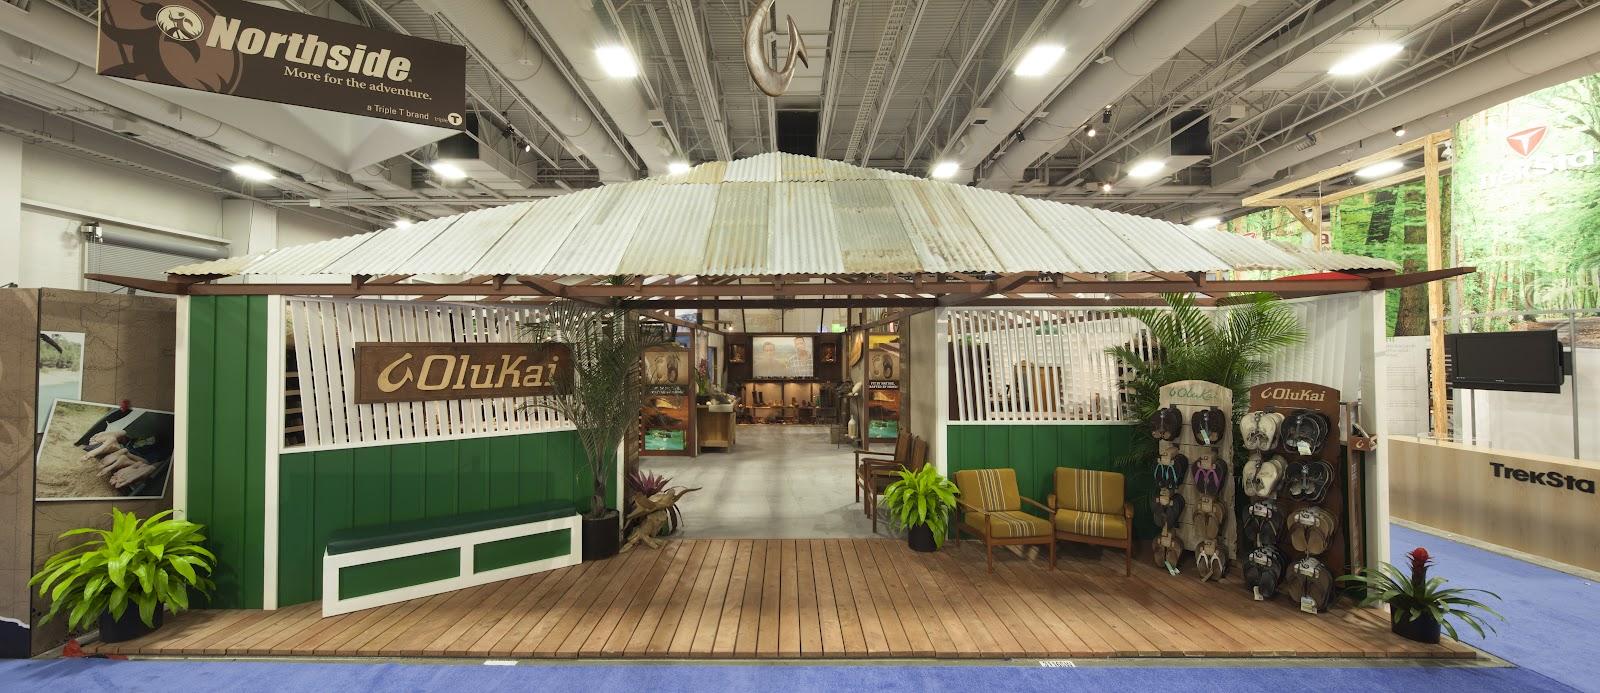 In Progress: SITEWORKS CREATES OLUKAI'S TRADE SHOW BOOTH